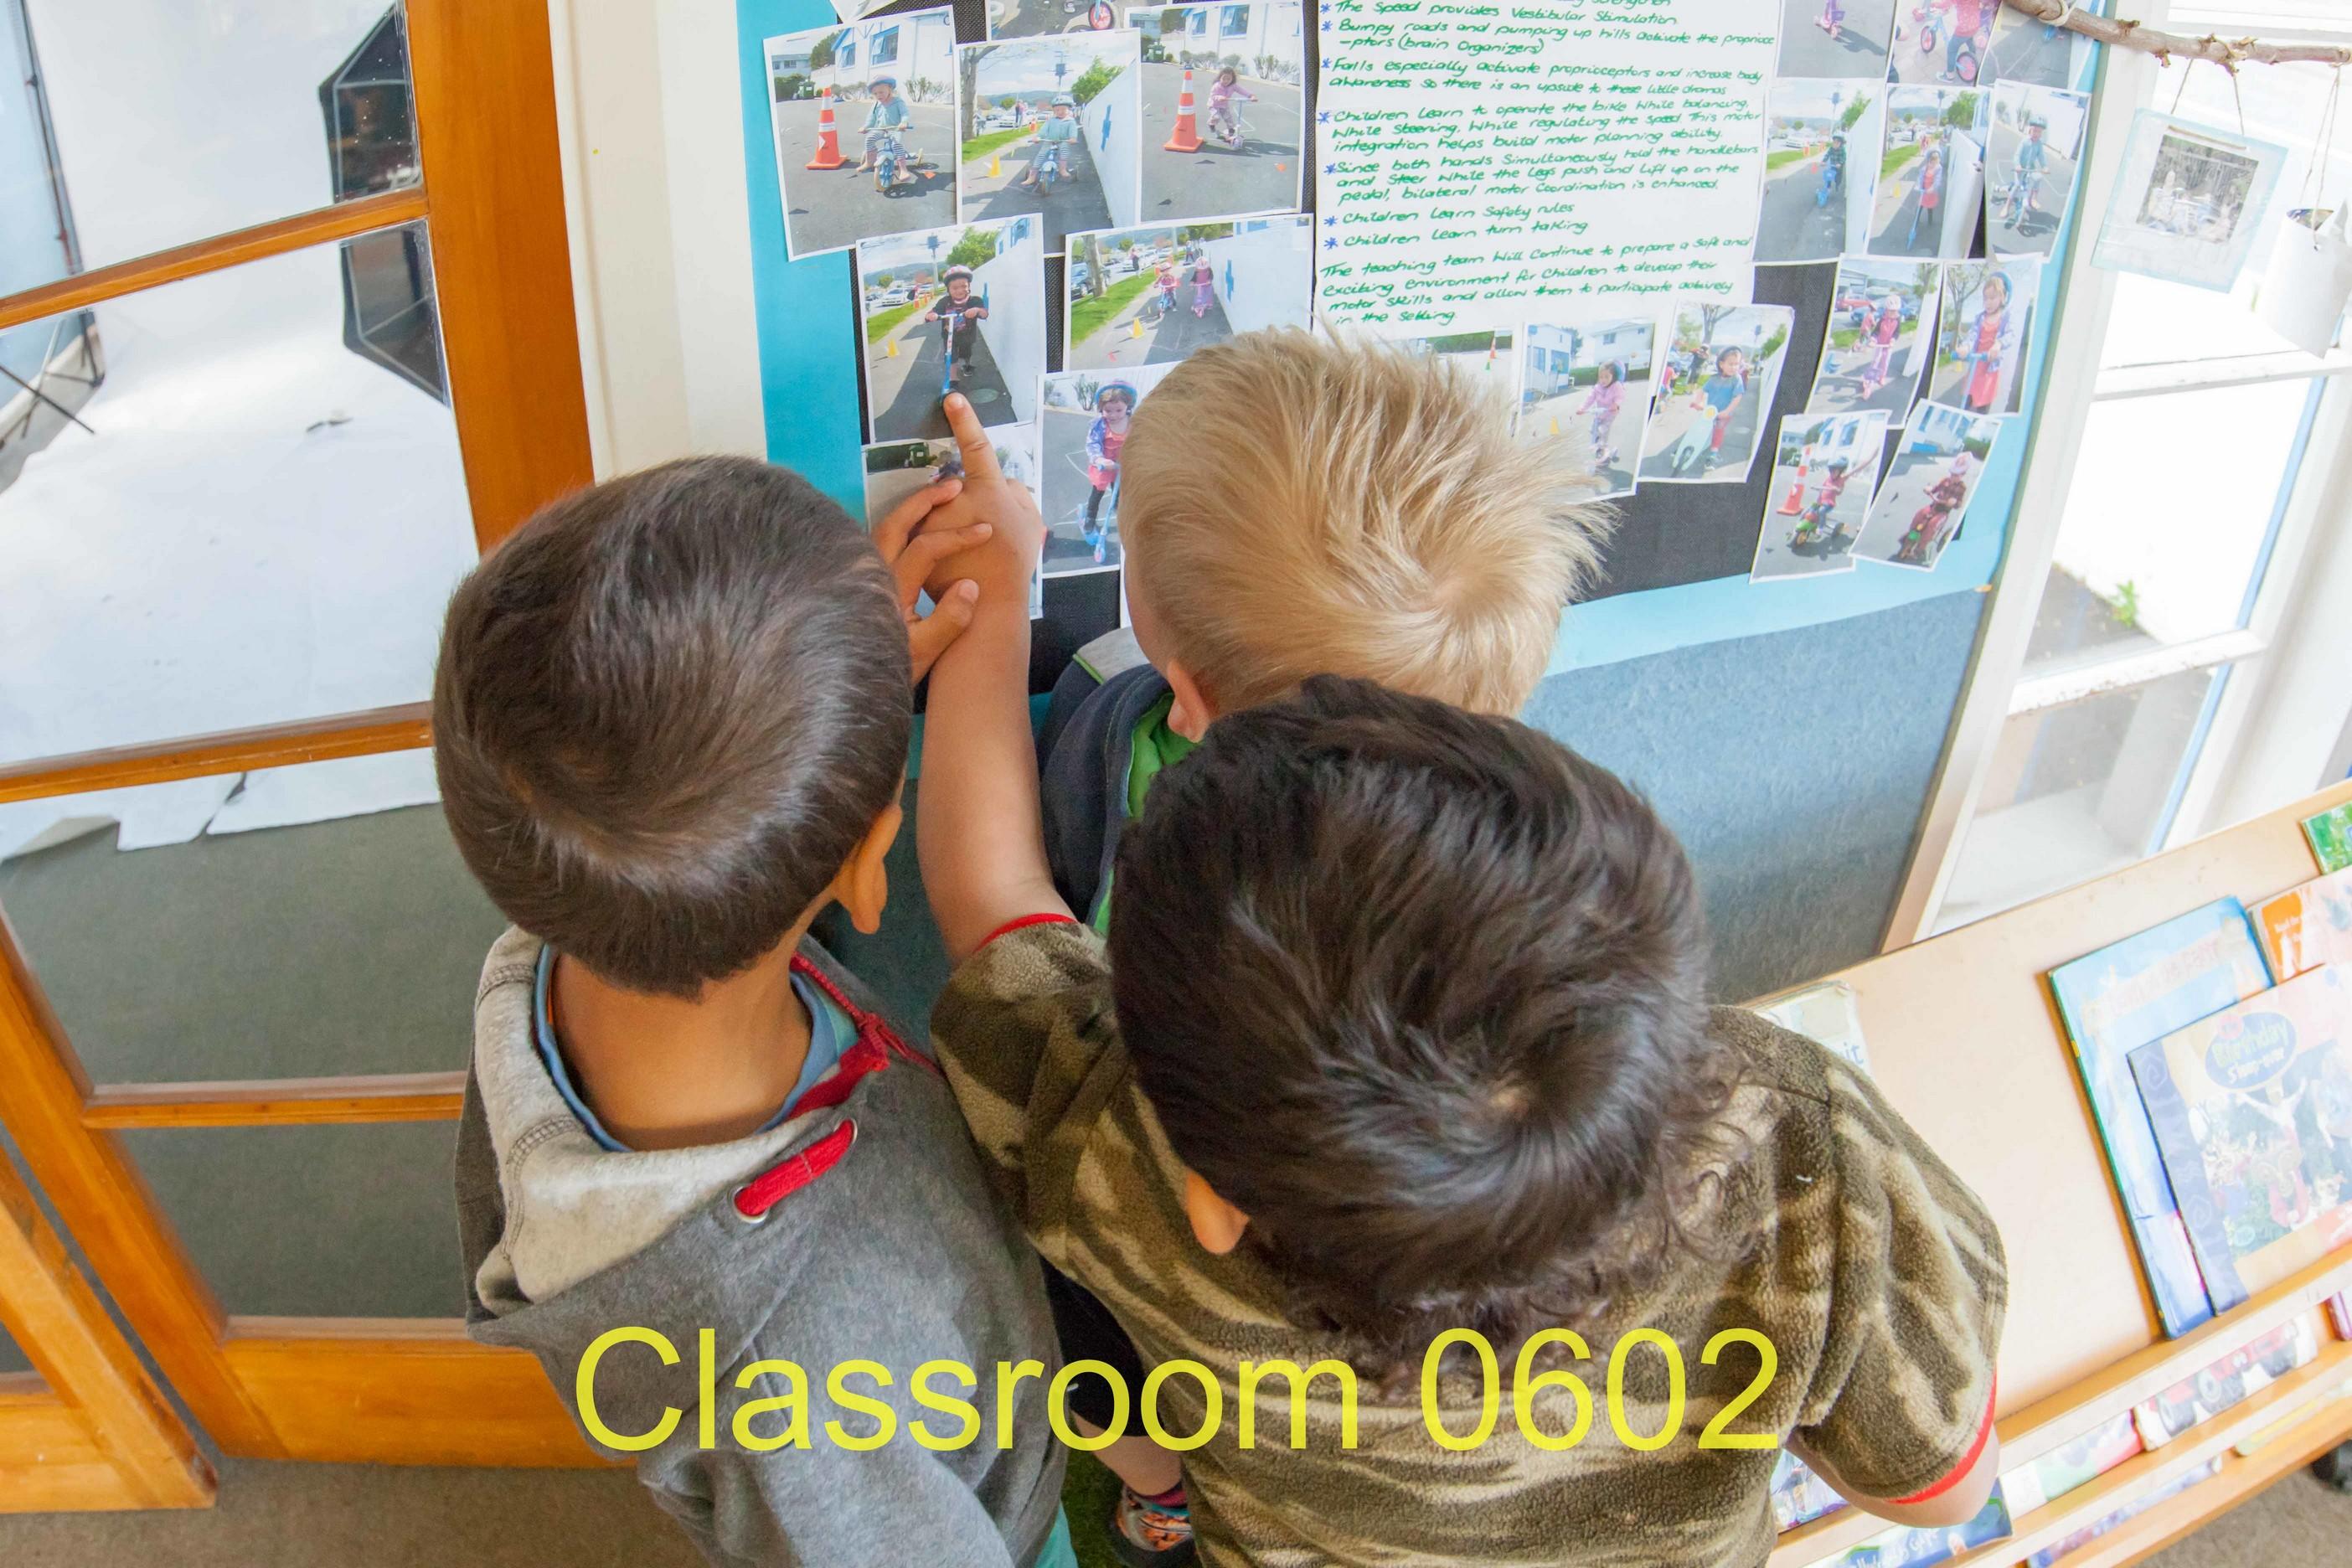 Classroom 0602